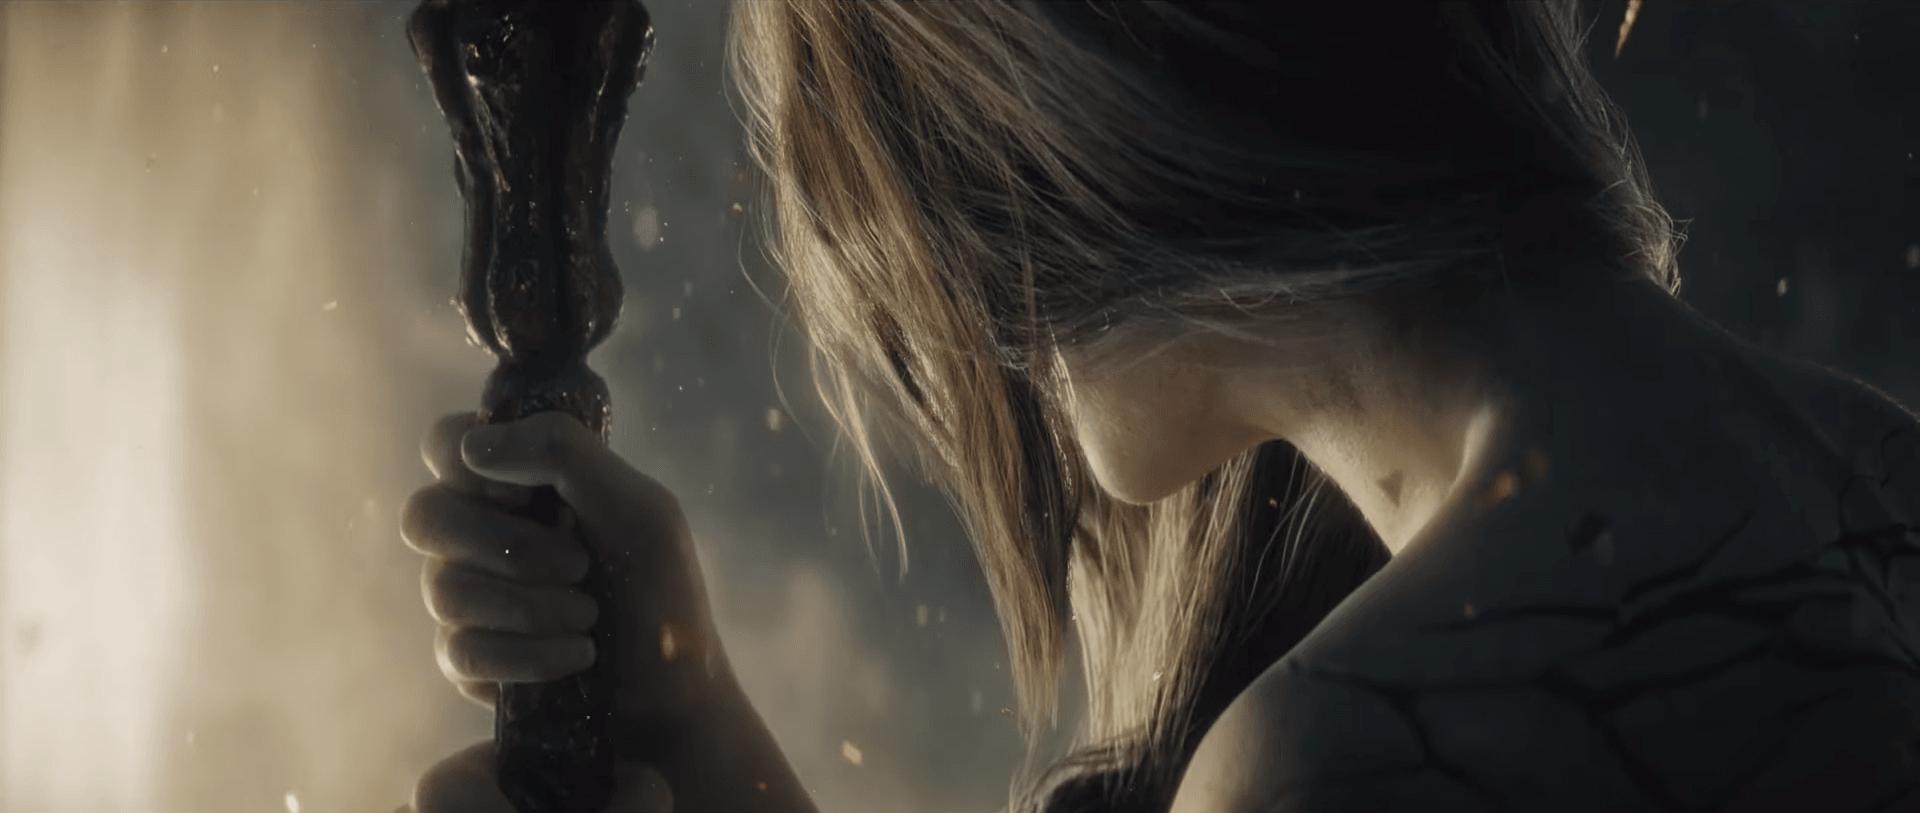 Annunciato Elden Ring durante la conferenza Xbox all'E3 2019 - EldenRingTrailer